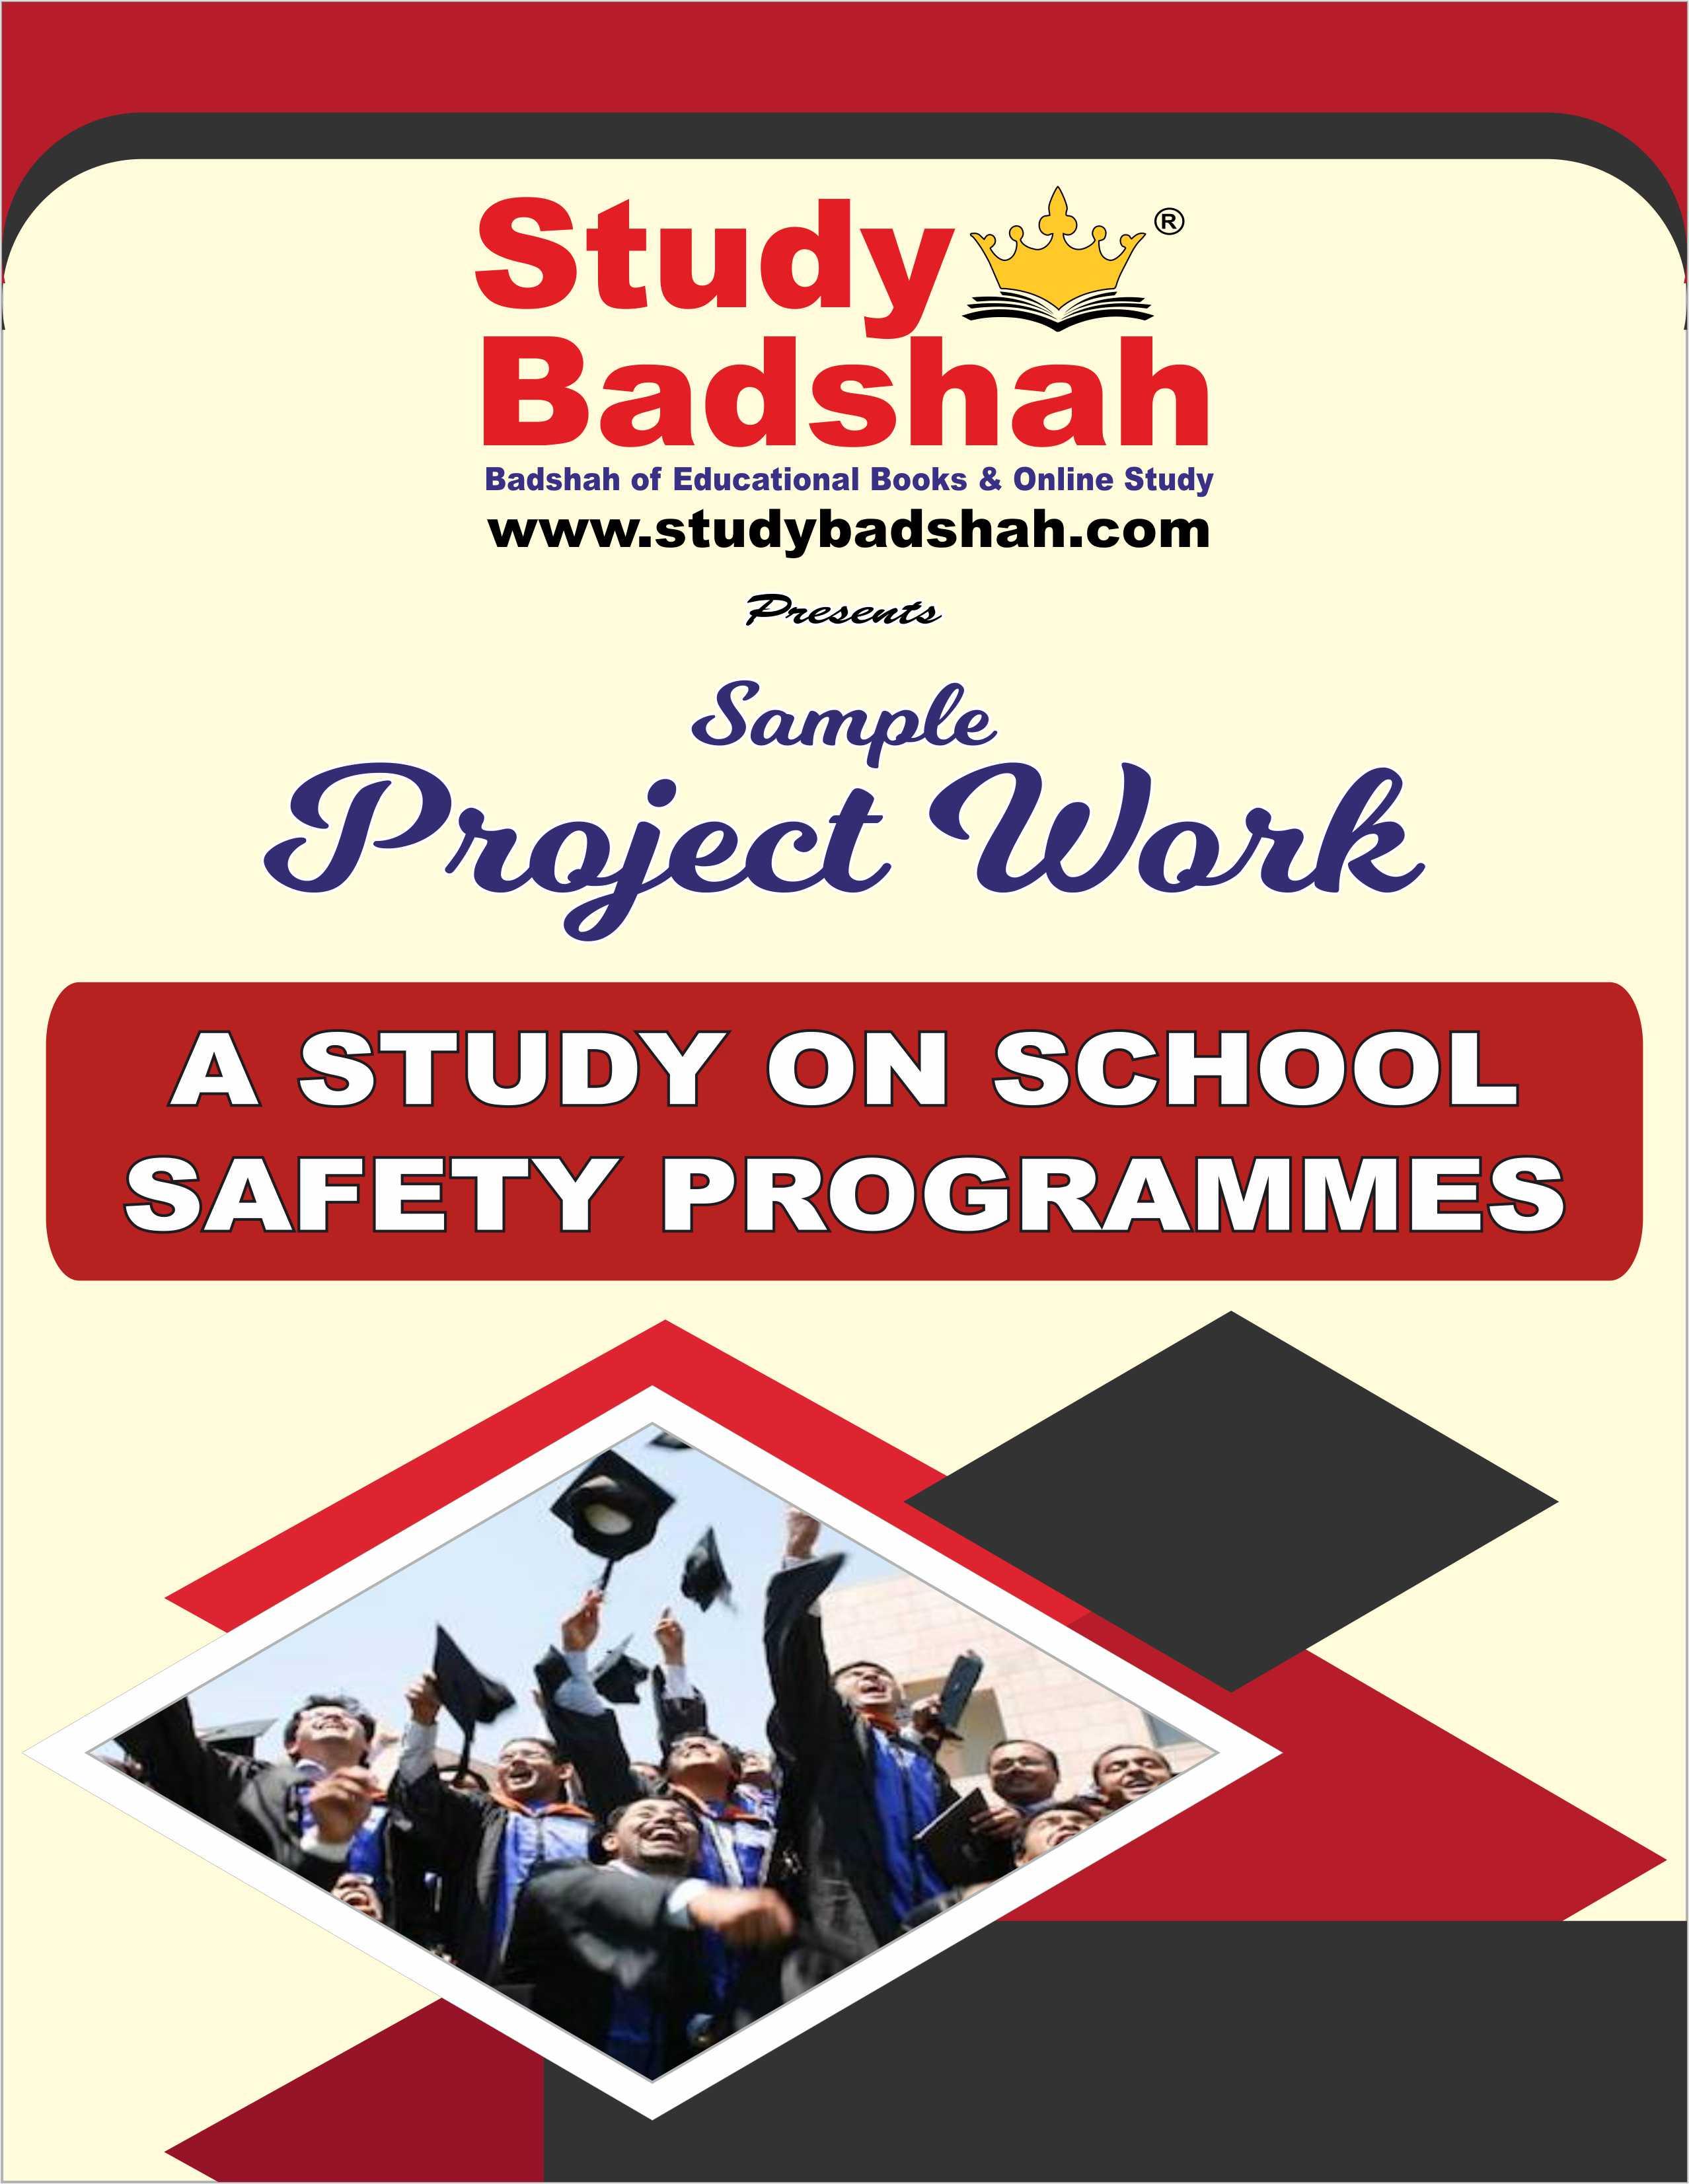 A Study on School Safety Programmes